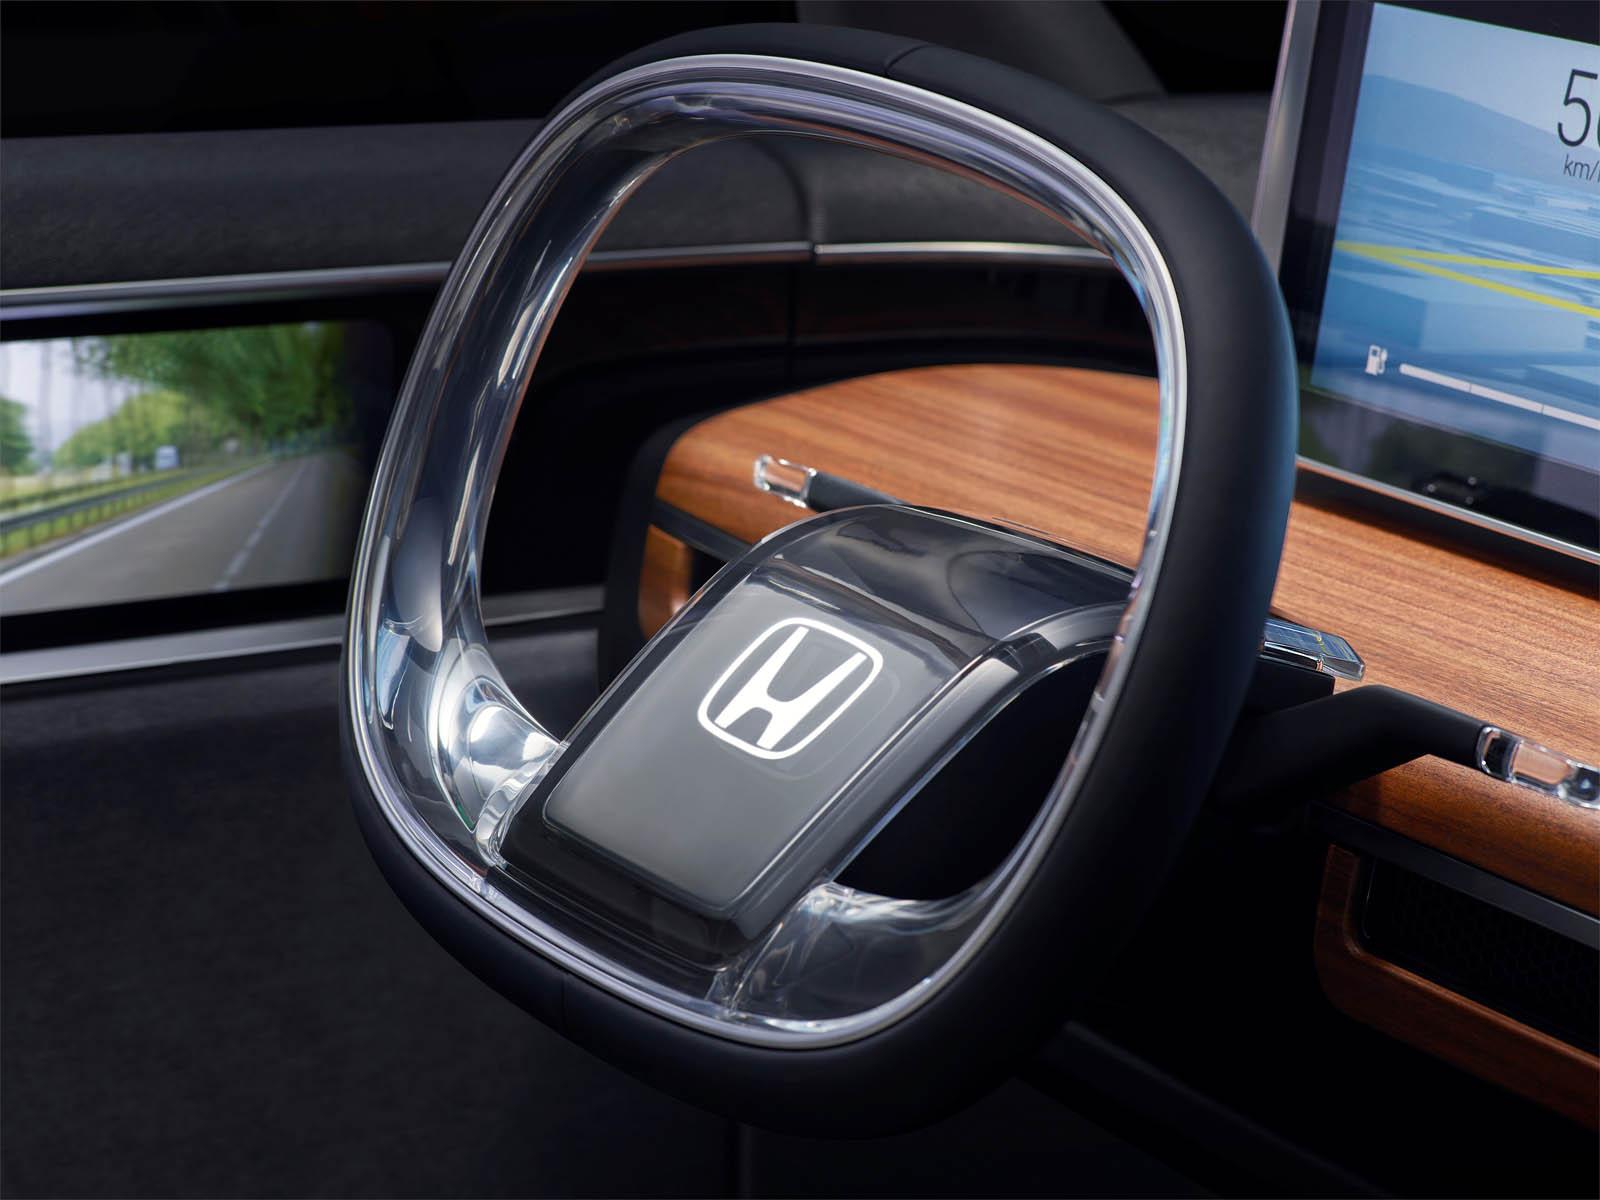 113869_Honda_Urban_EV_Concept_unveiled_at_the_Frankfurt_Motor_Show%2Bcopy.jpg